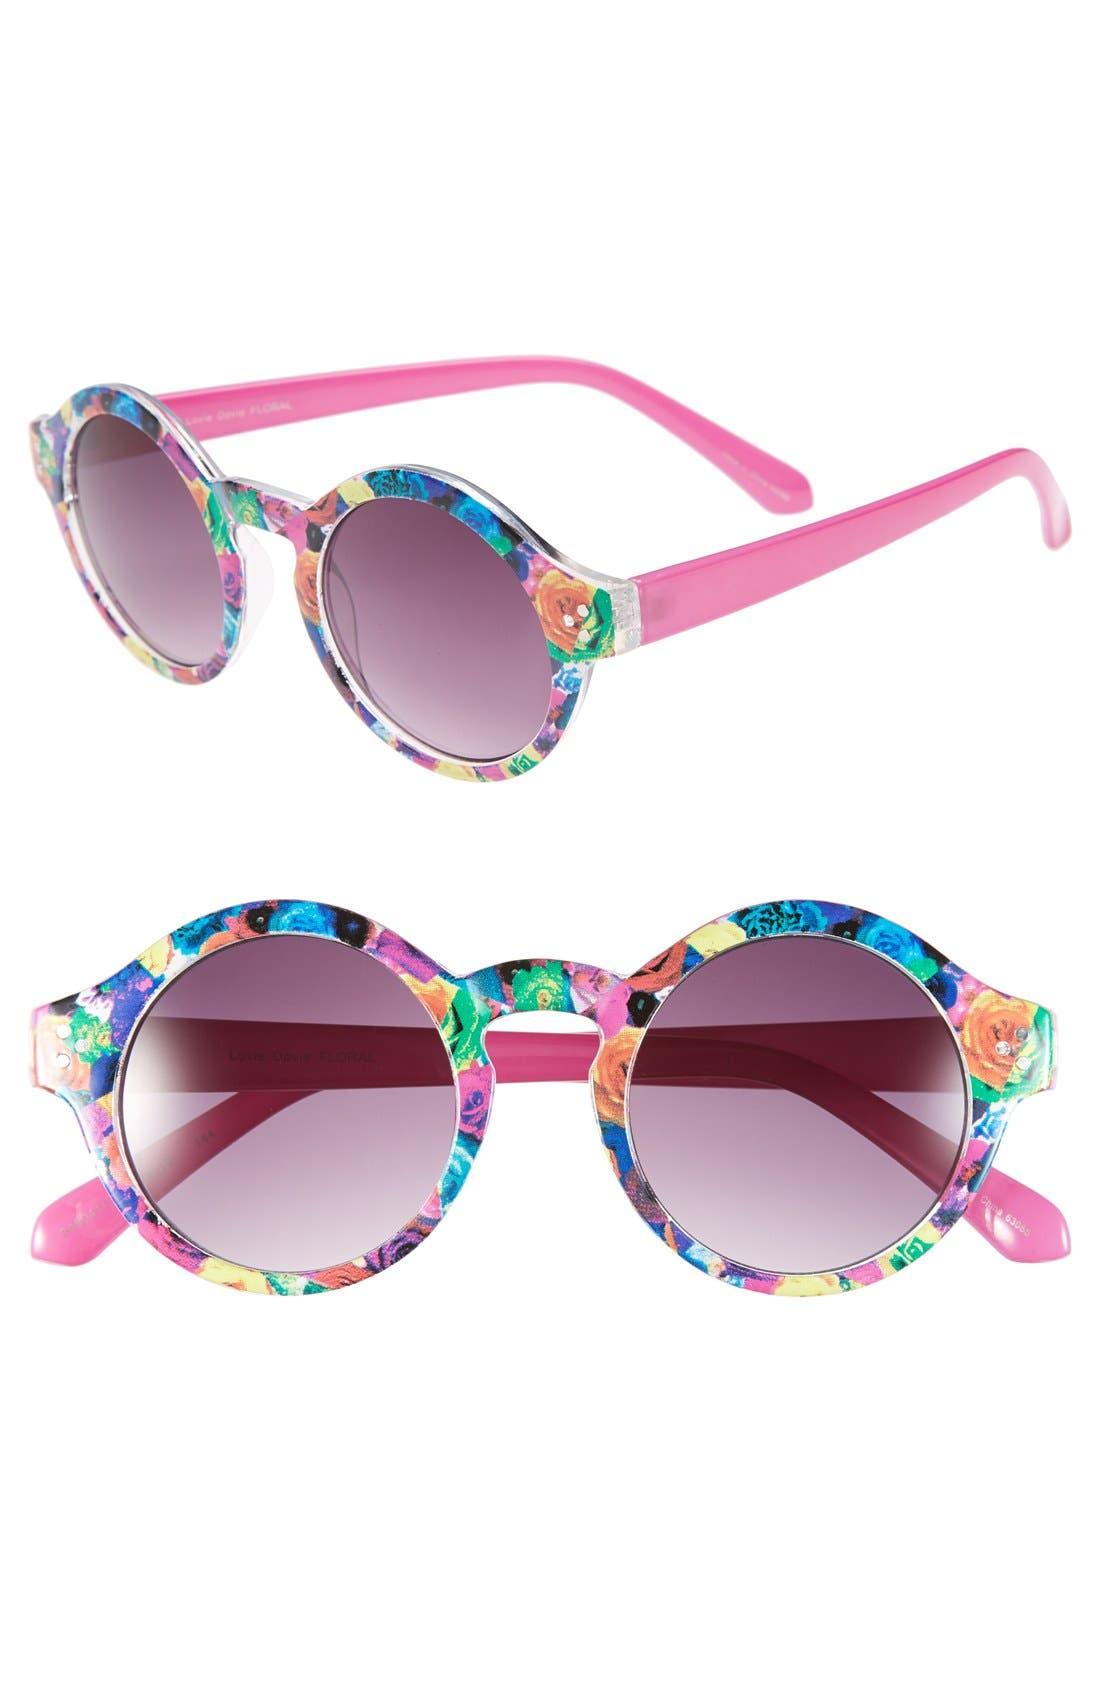 Main Image - Outlook Eyewear 'Lovie Dovie' 48mm Sunglasses